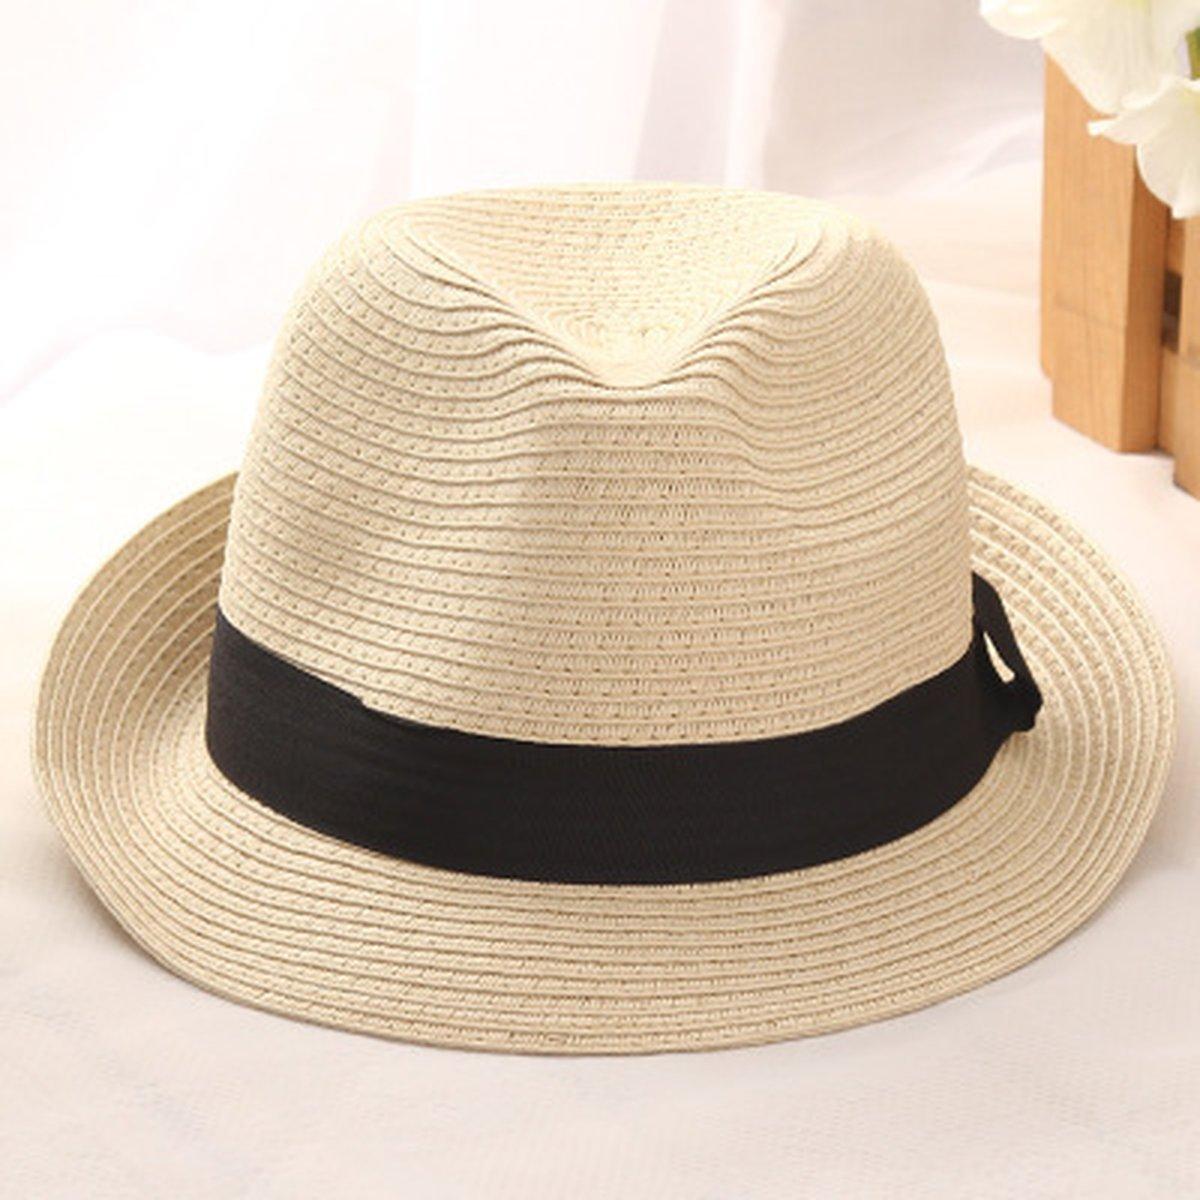 Sun Hat for Women Mens Jazz Panama Soft Cap Feedoras Summer Beach Tropical Hat